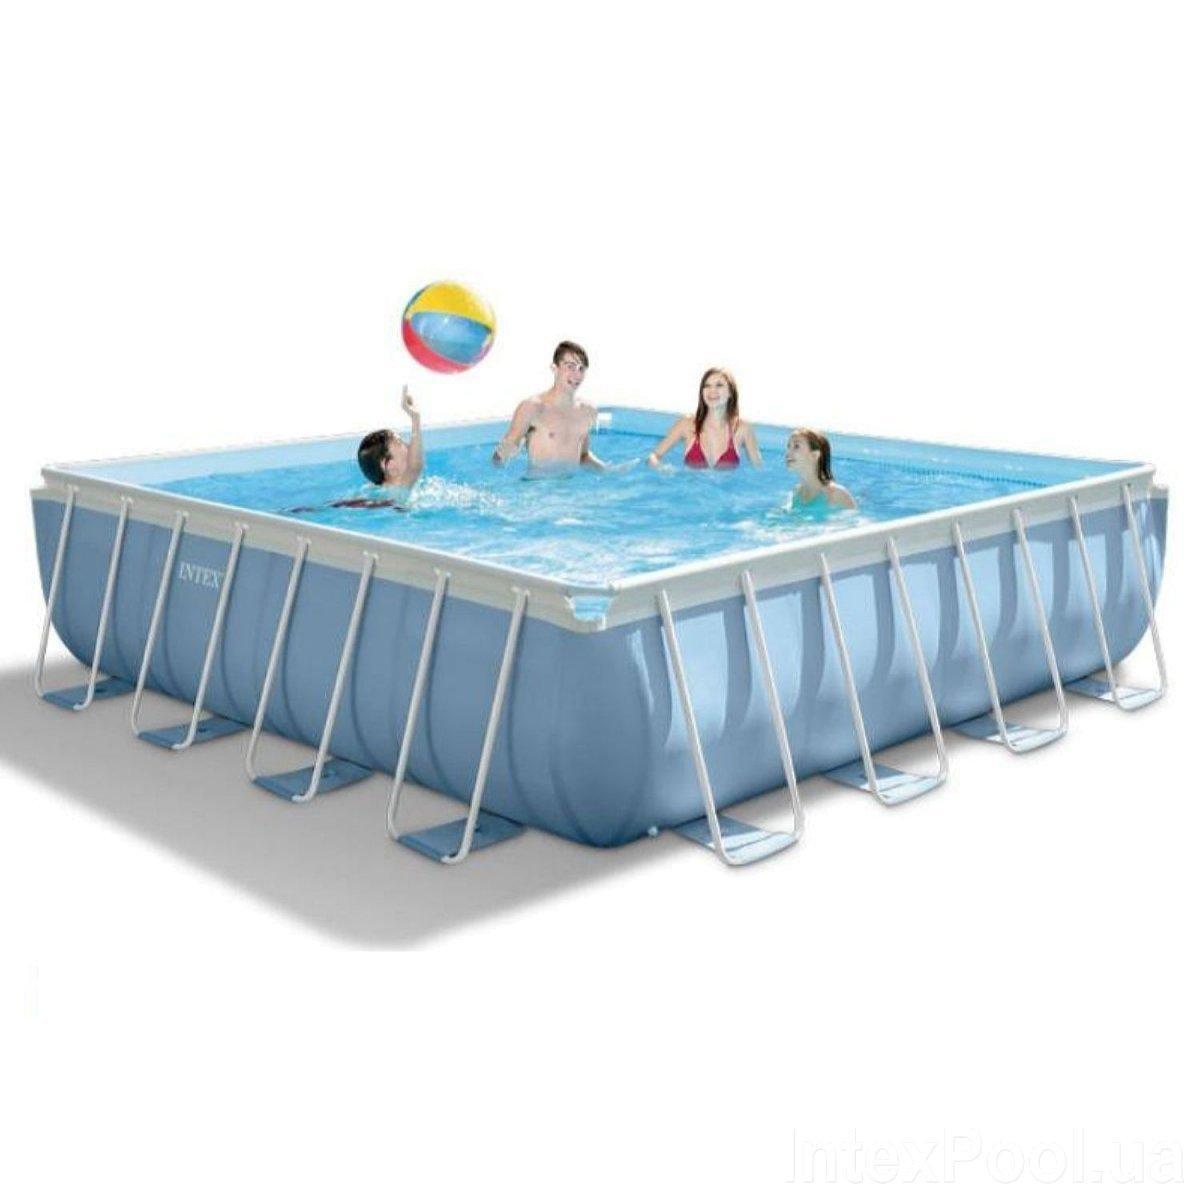 Каркасный бассейн Intex 28766 - 0, 488 x 488 x 122 см